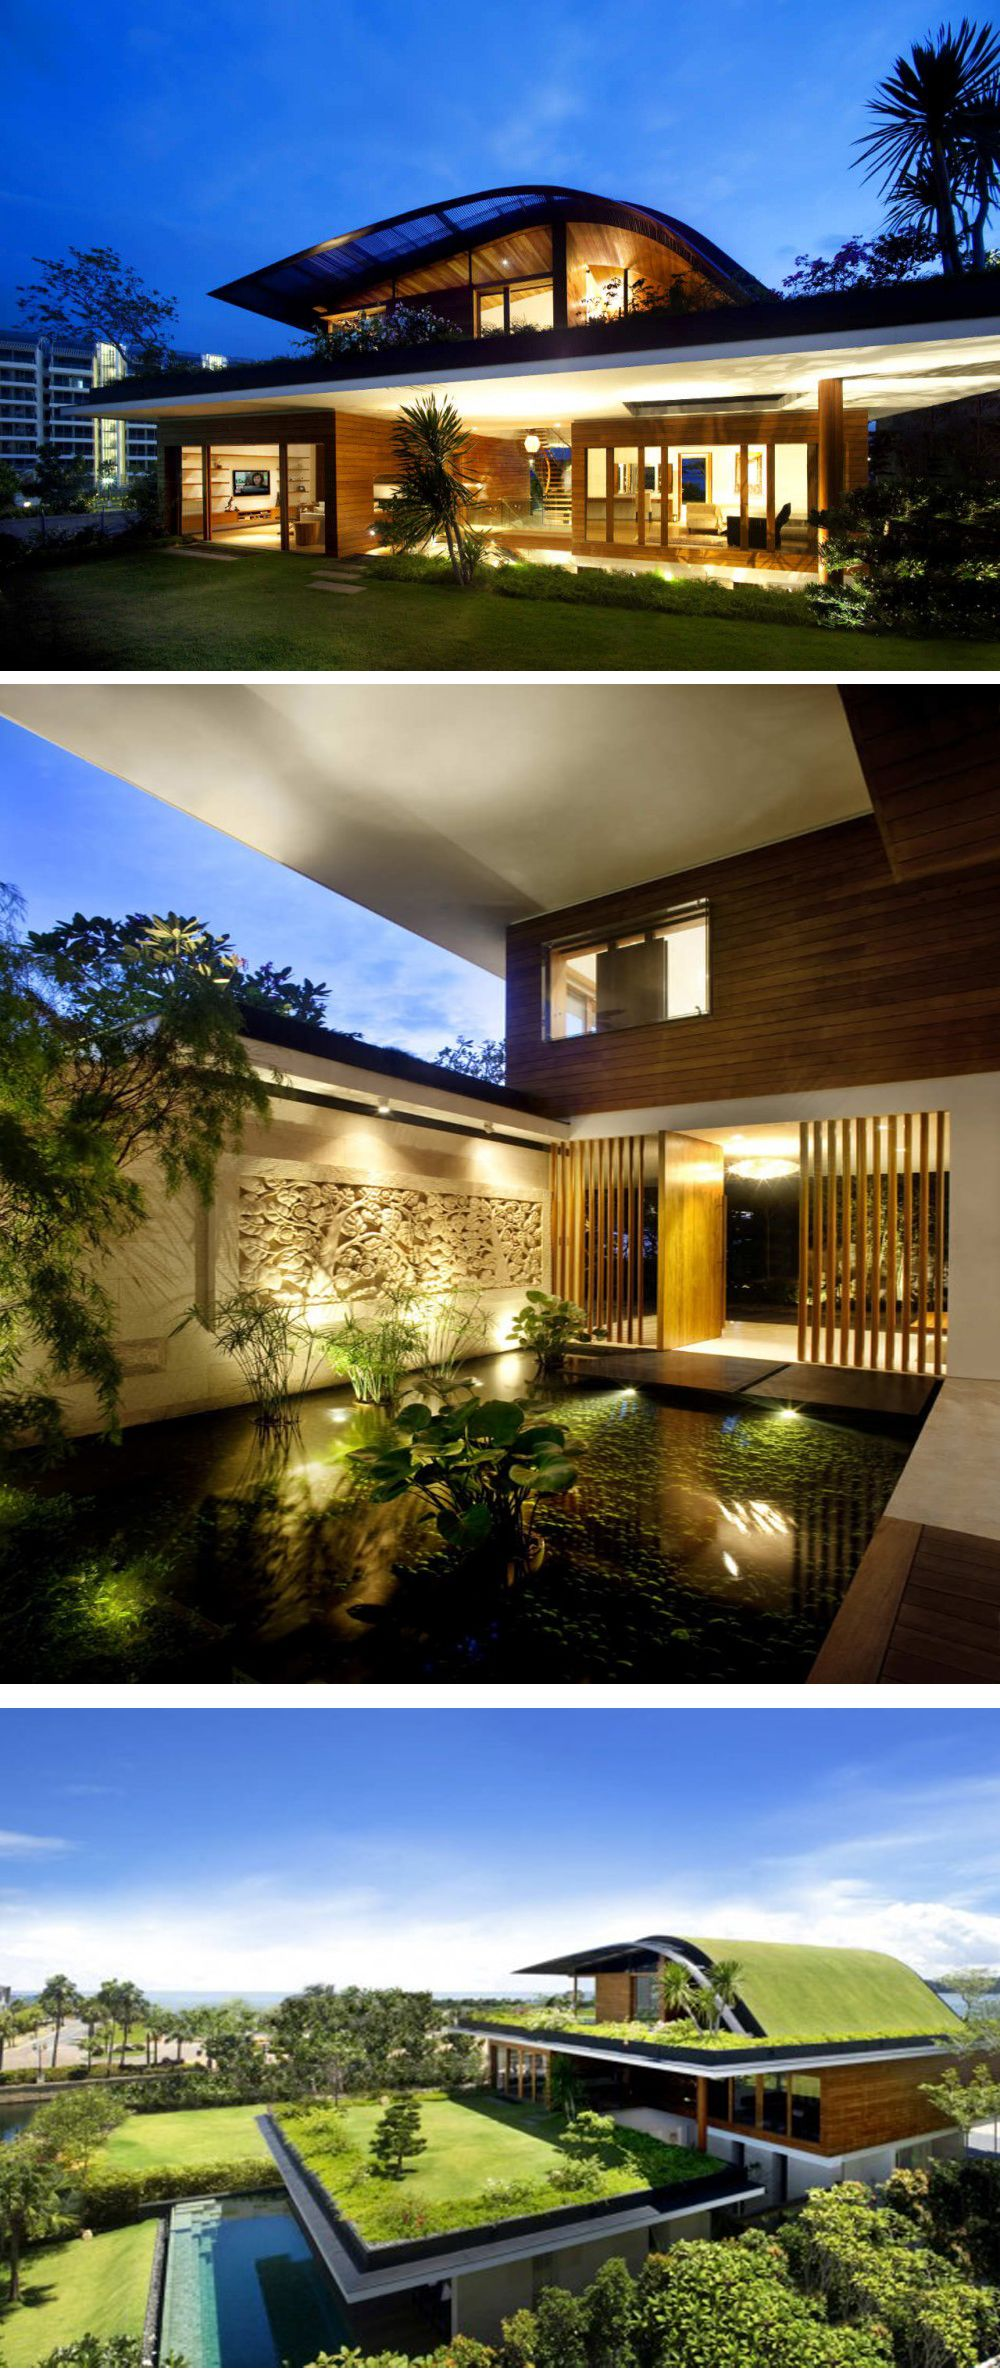 sky garden house Sky Garden House / Guz Architects | One dayhome | Pinterest